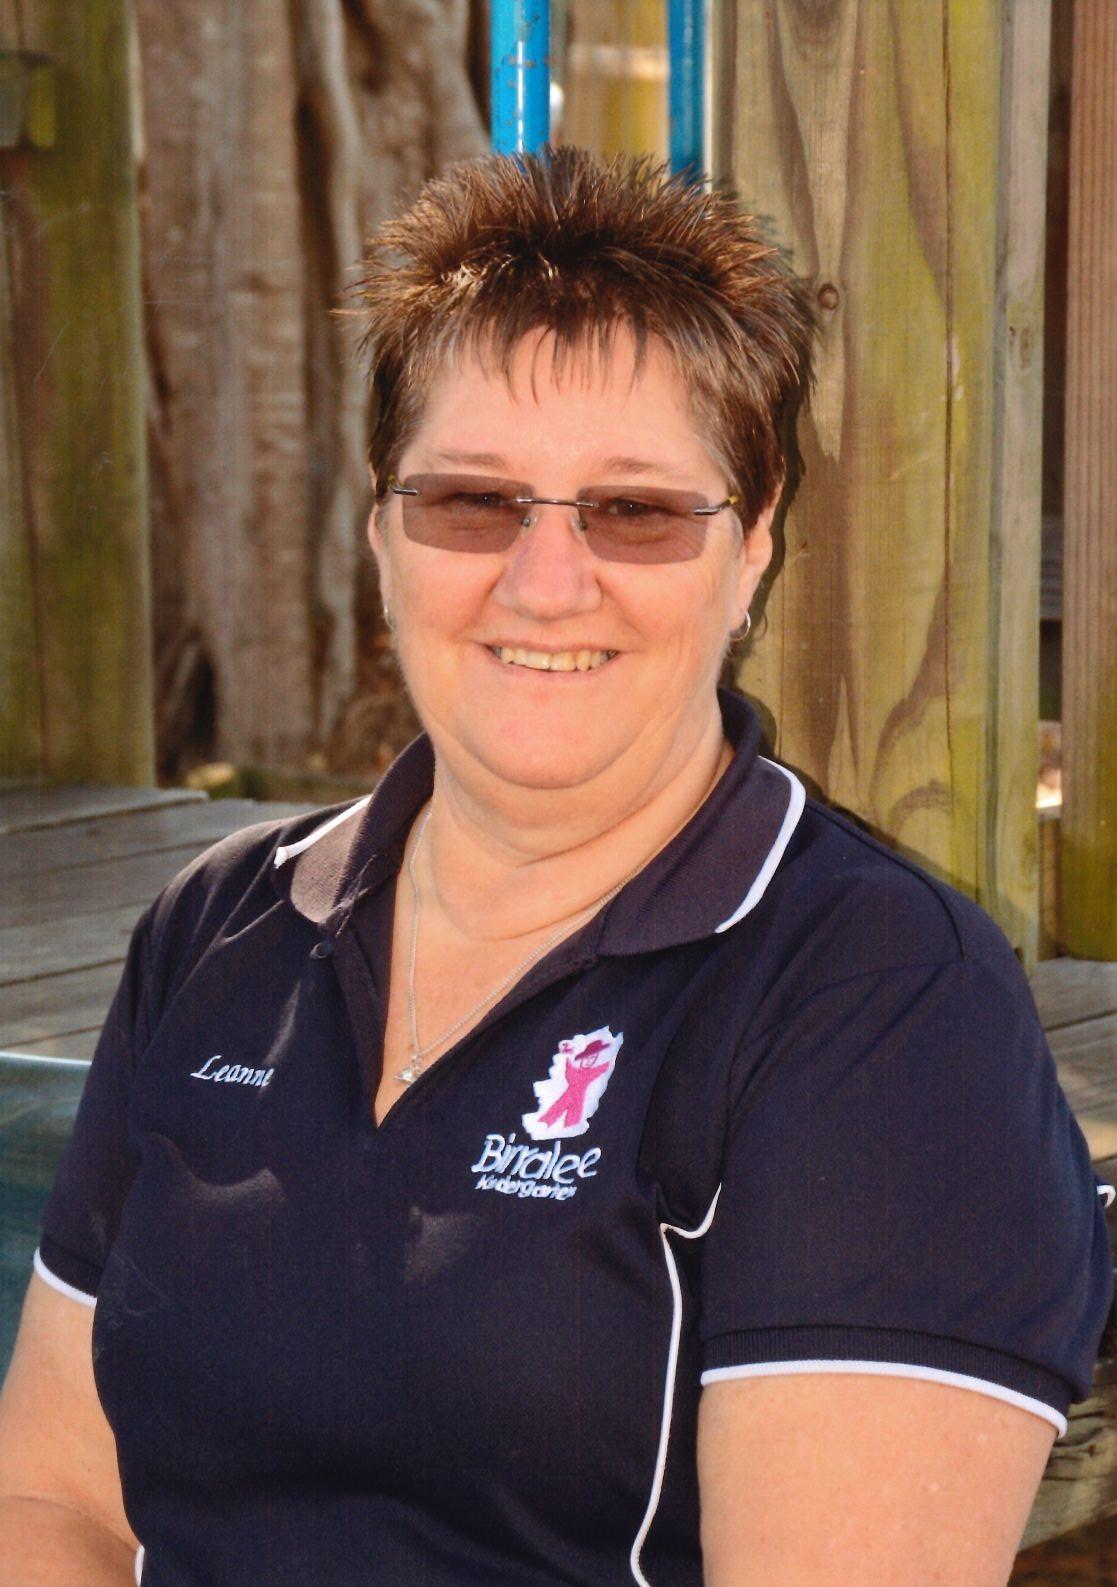 Mrs Leanne Tighe